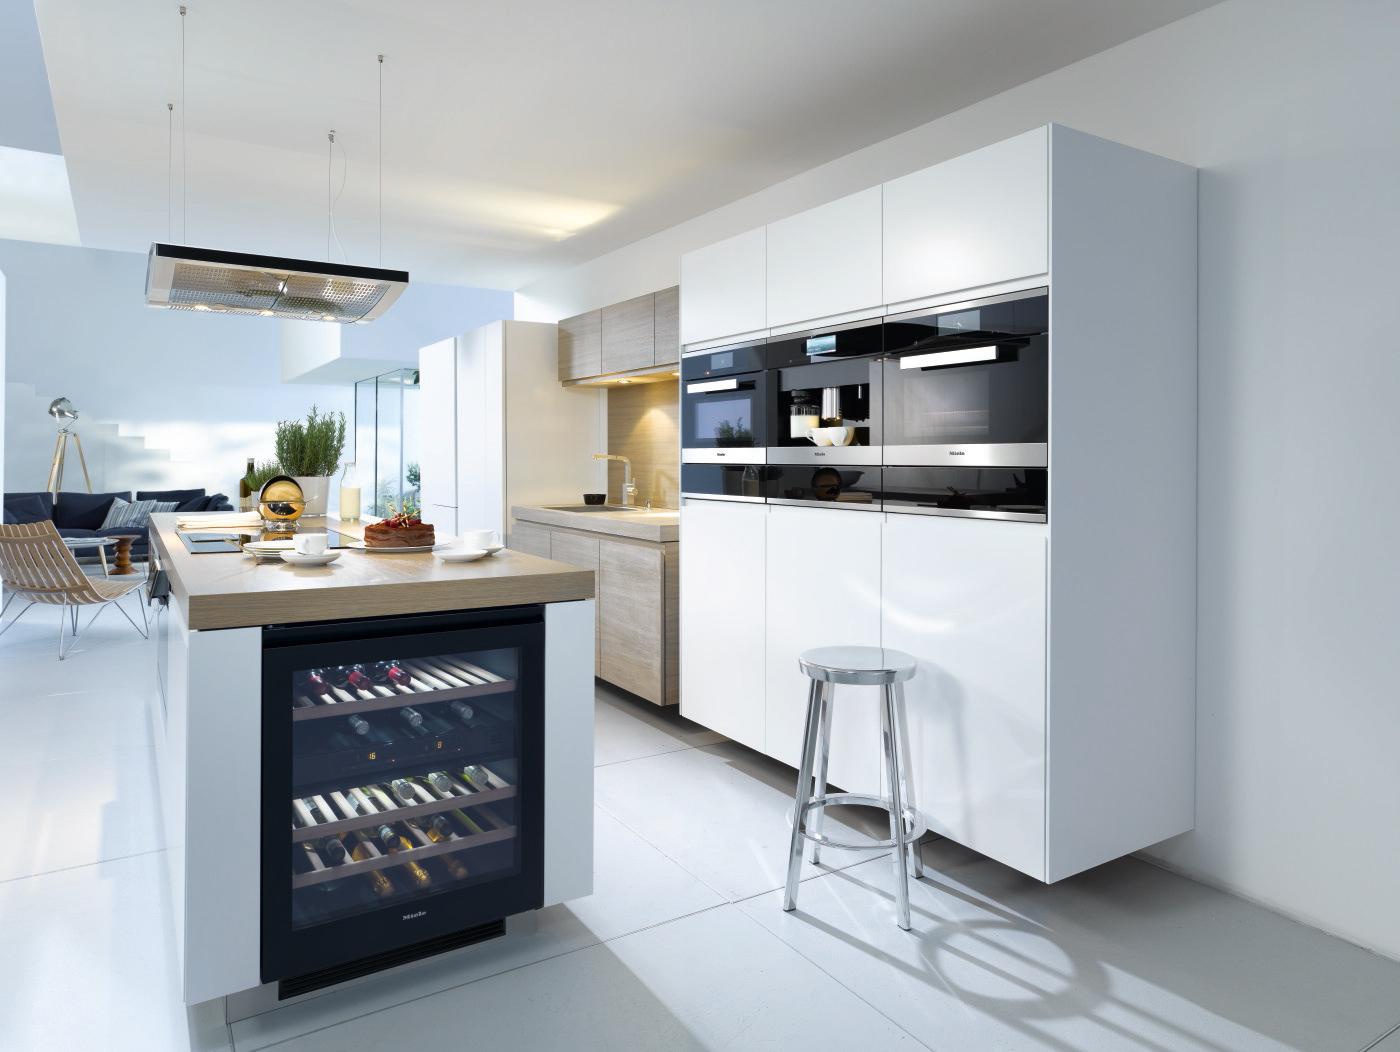 Uncategorized. Ultimate Kitchen Appliances. jamesmcavoybr Home Design